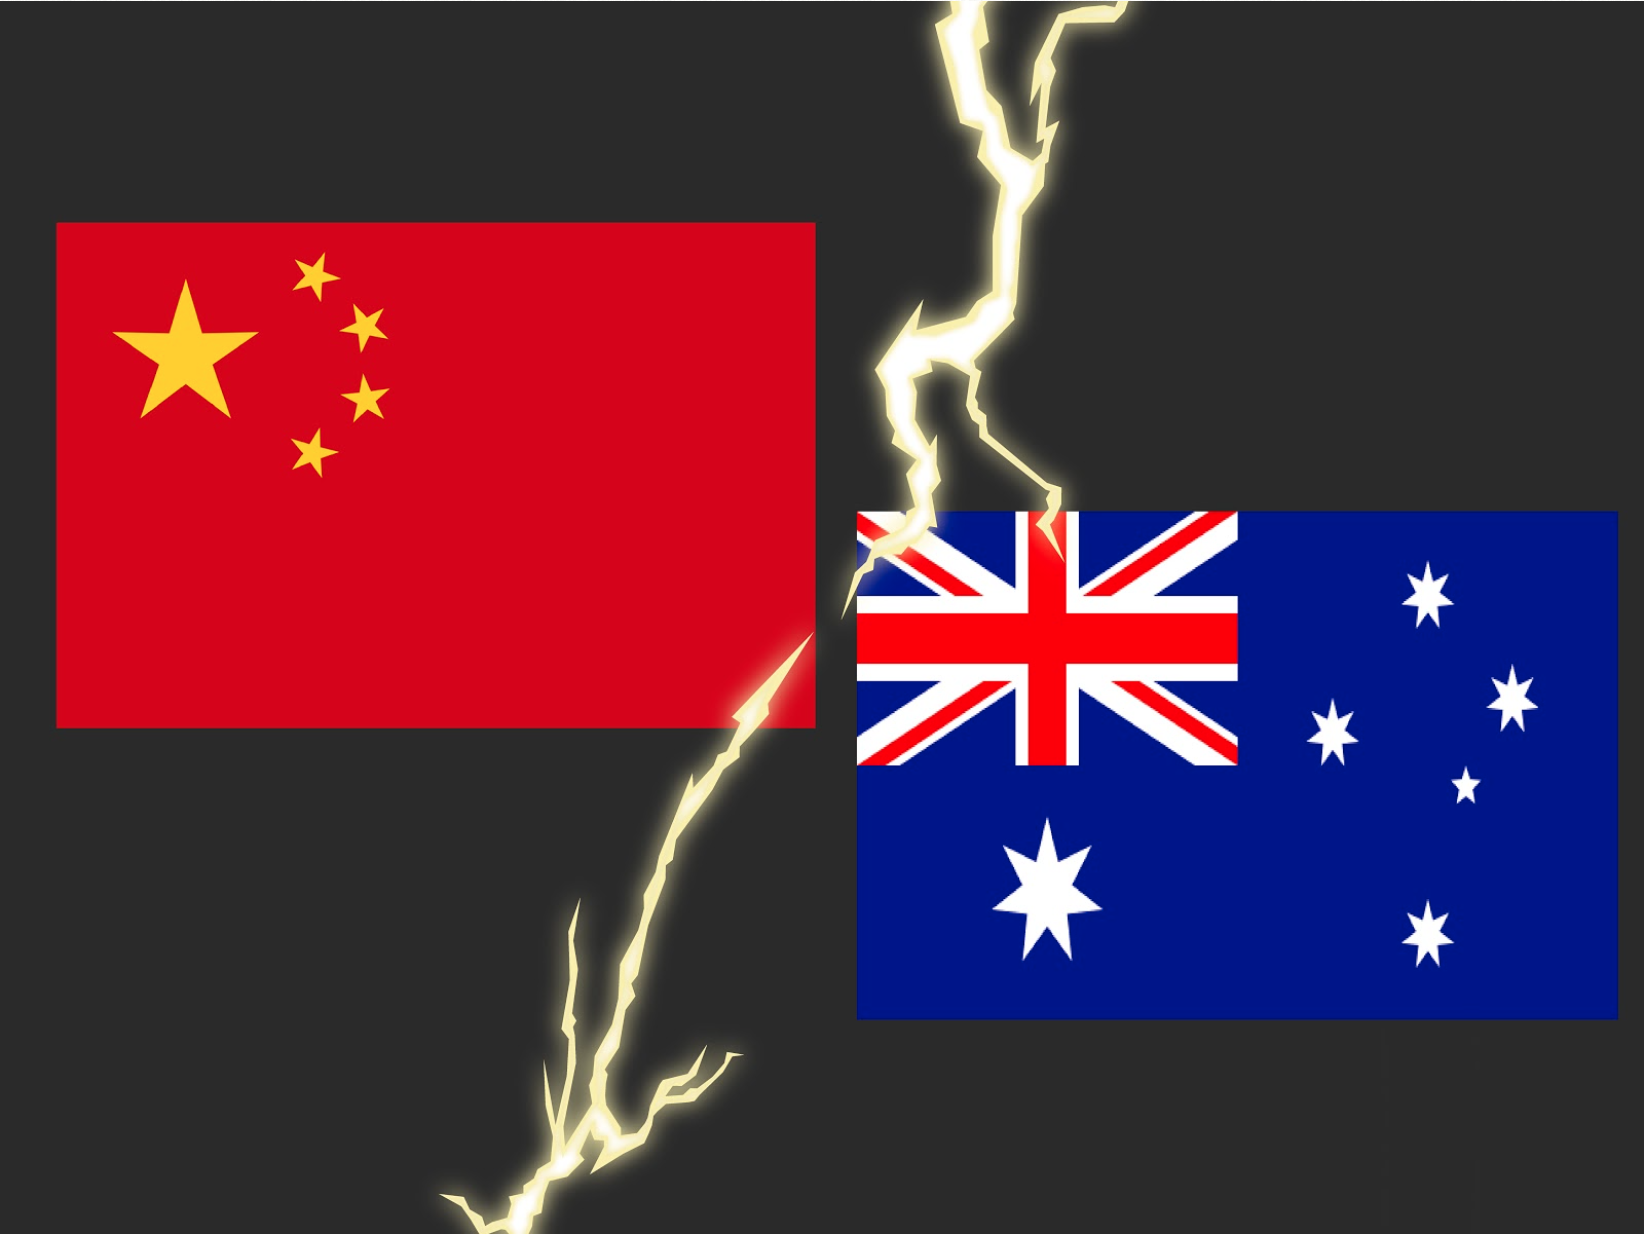 FX_豪ドル_対中国